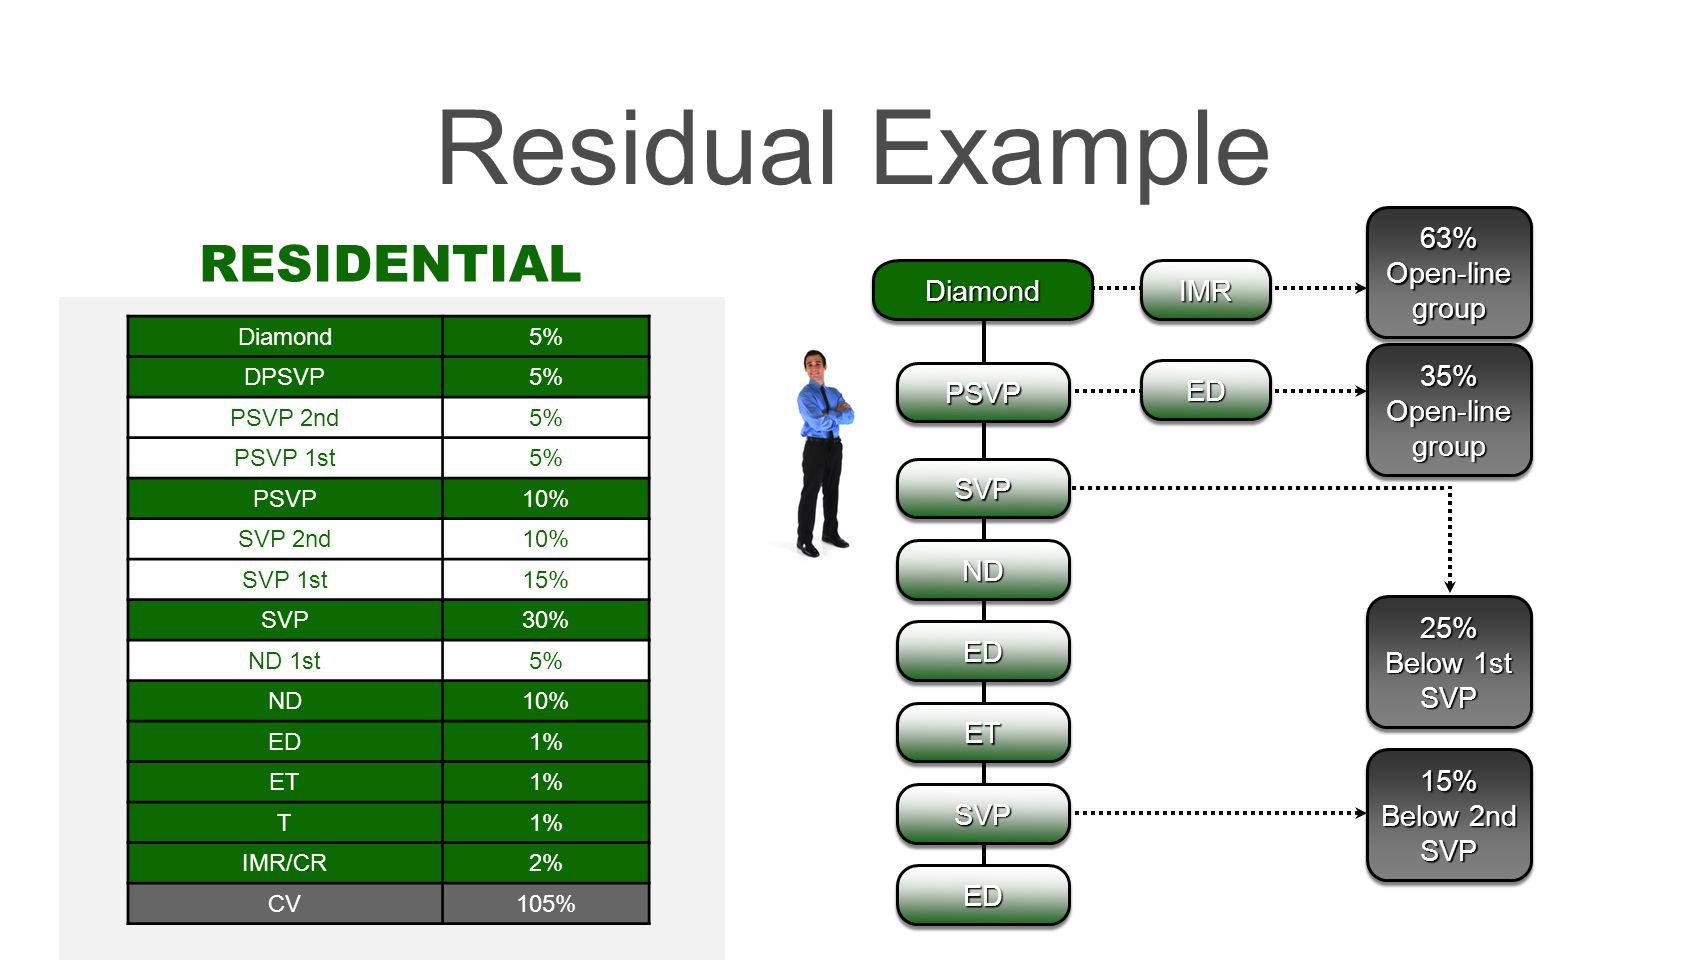 15% Below 2nd SVP15% SVP EDED 35% Open-line group 35% IMRIMR 63% 63% 25% Below 1st SVP 25% Residual Example Diamond5% DPSVP5% PSVP 2nd5% PSVP 1st5% PS